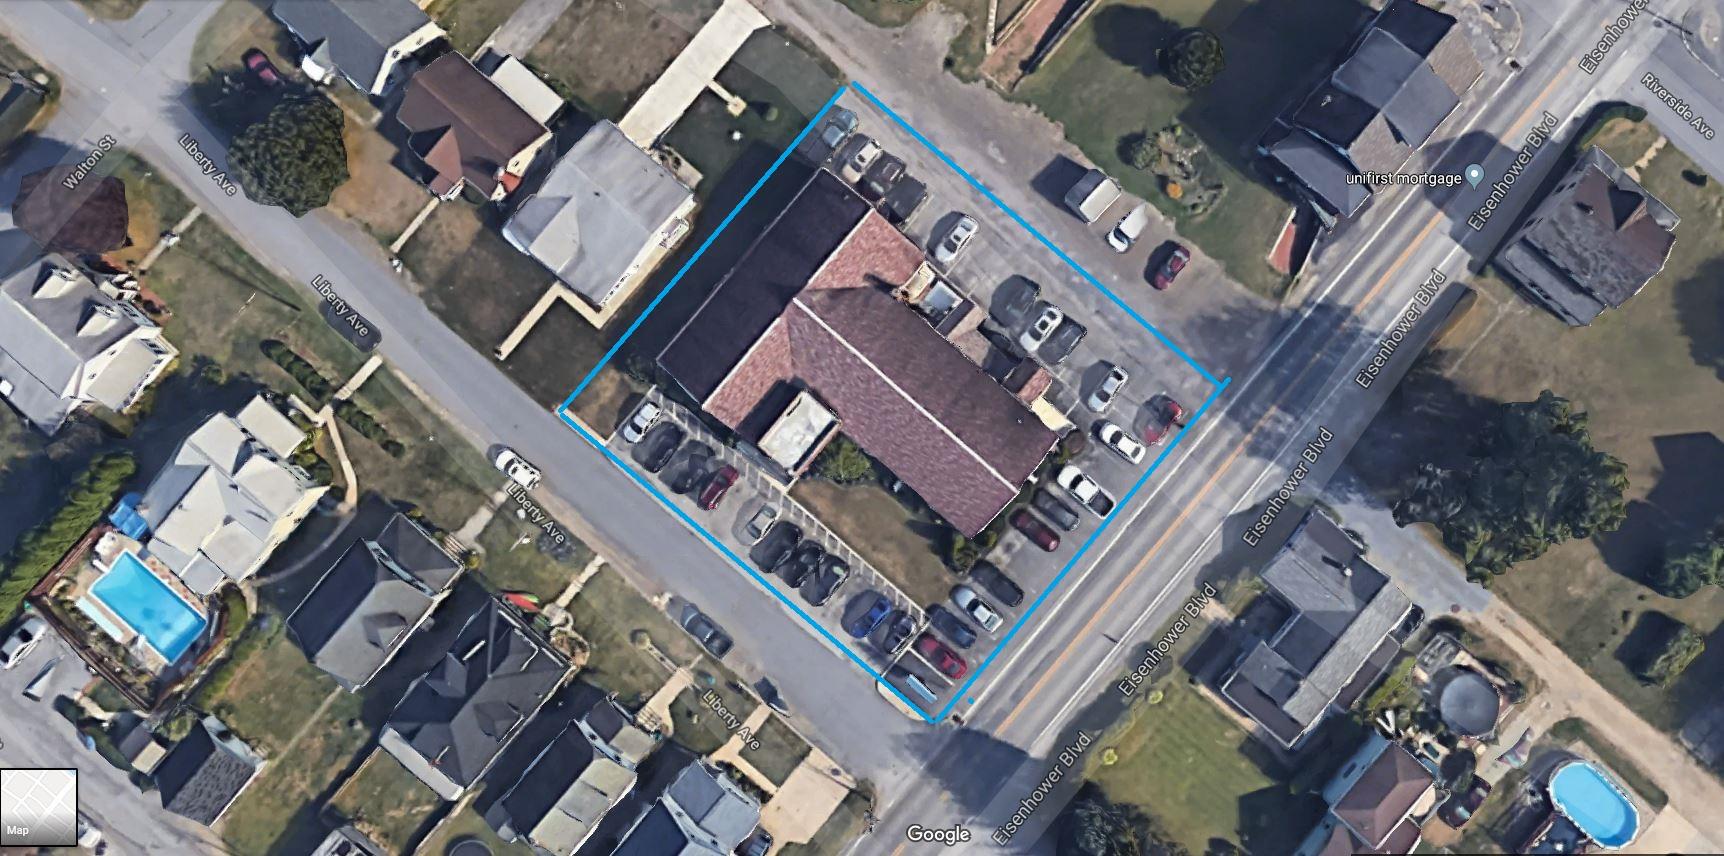 217 Eisenhower Blvd Aerial.JPG